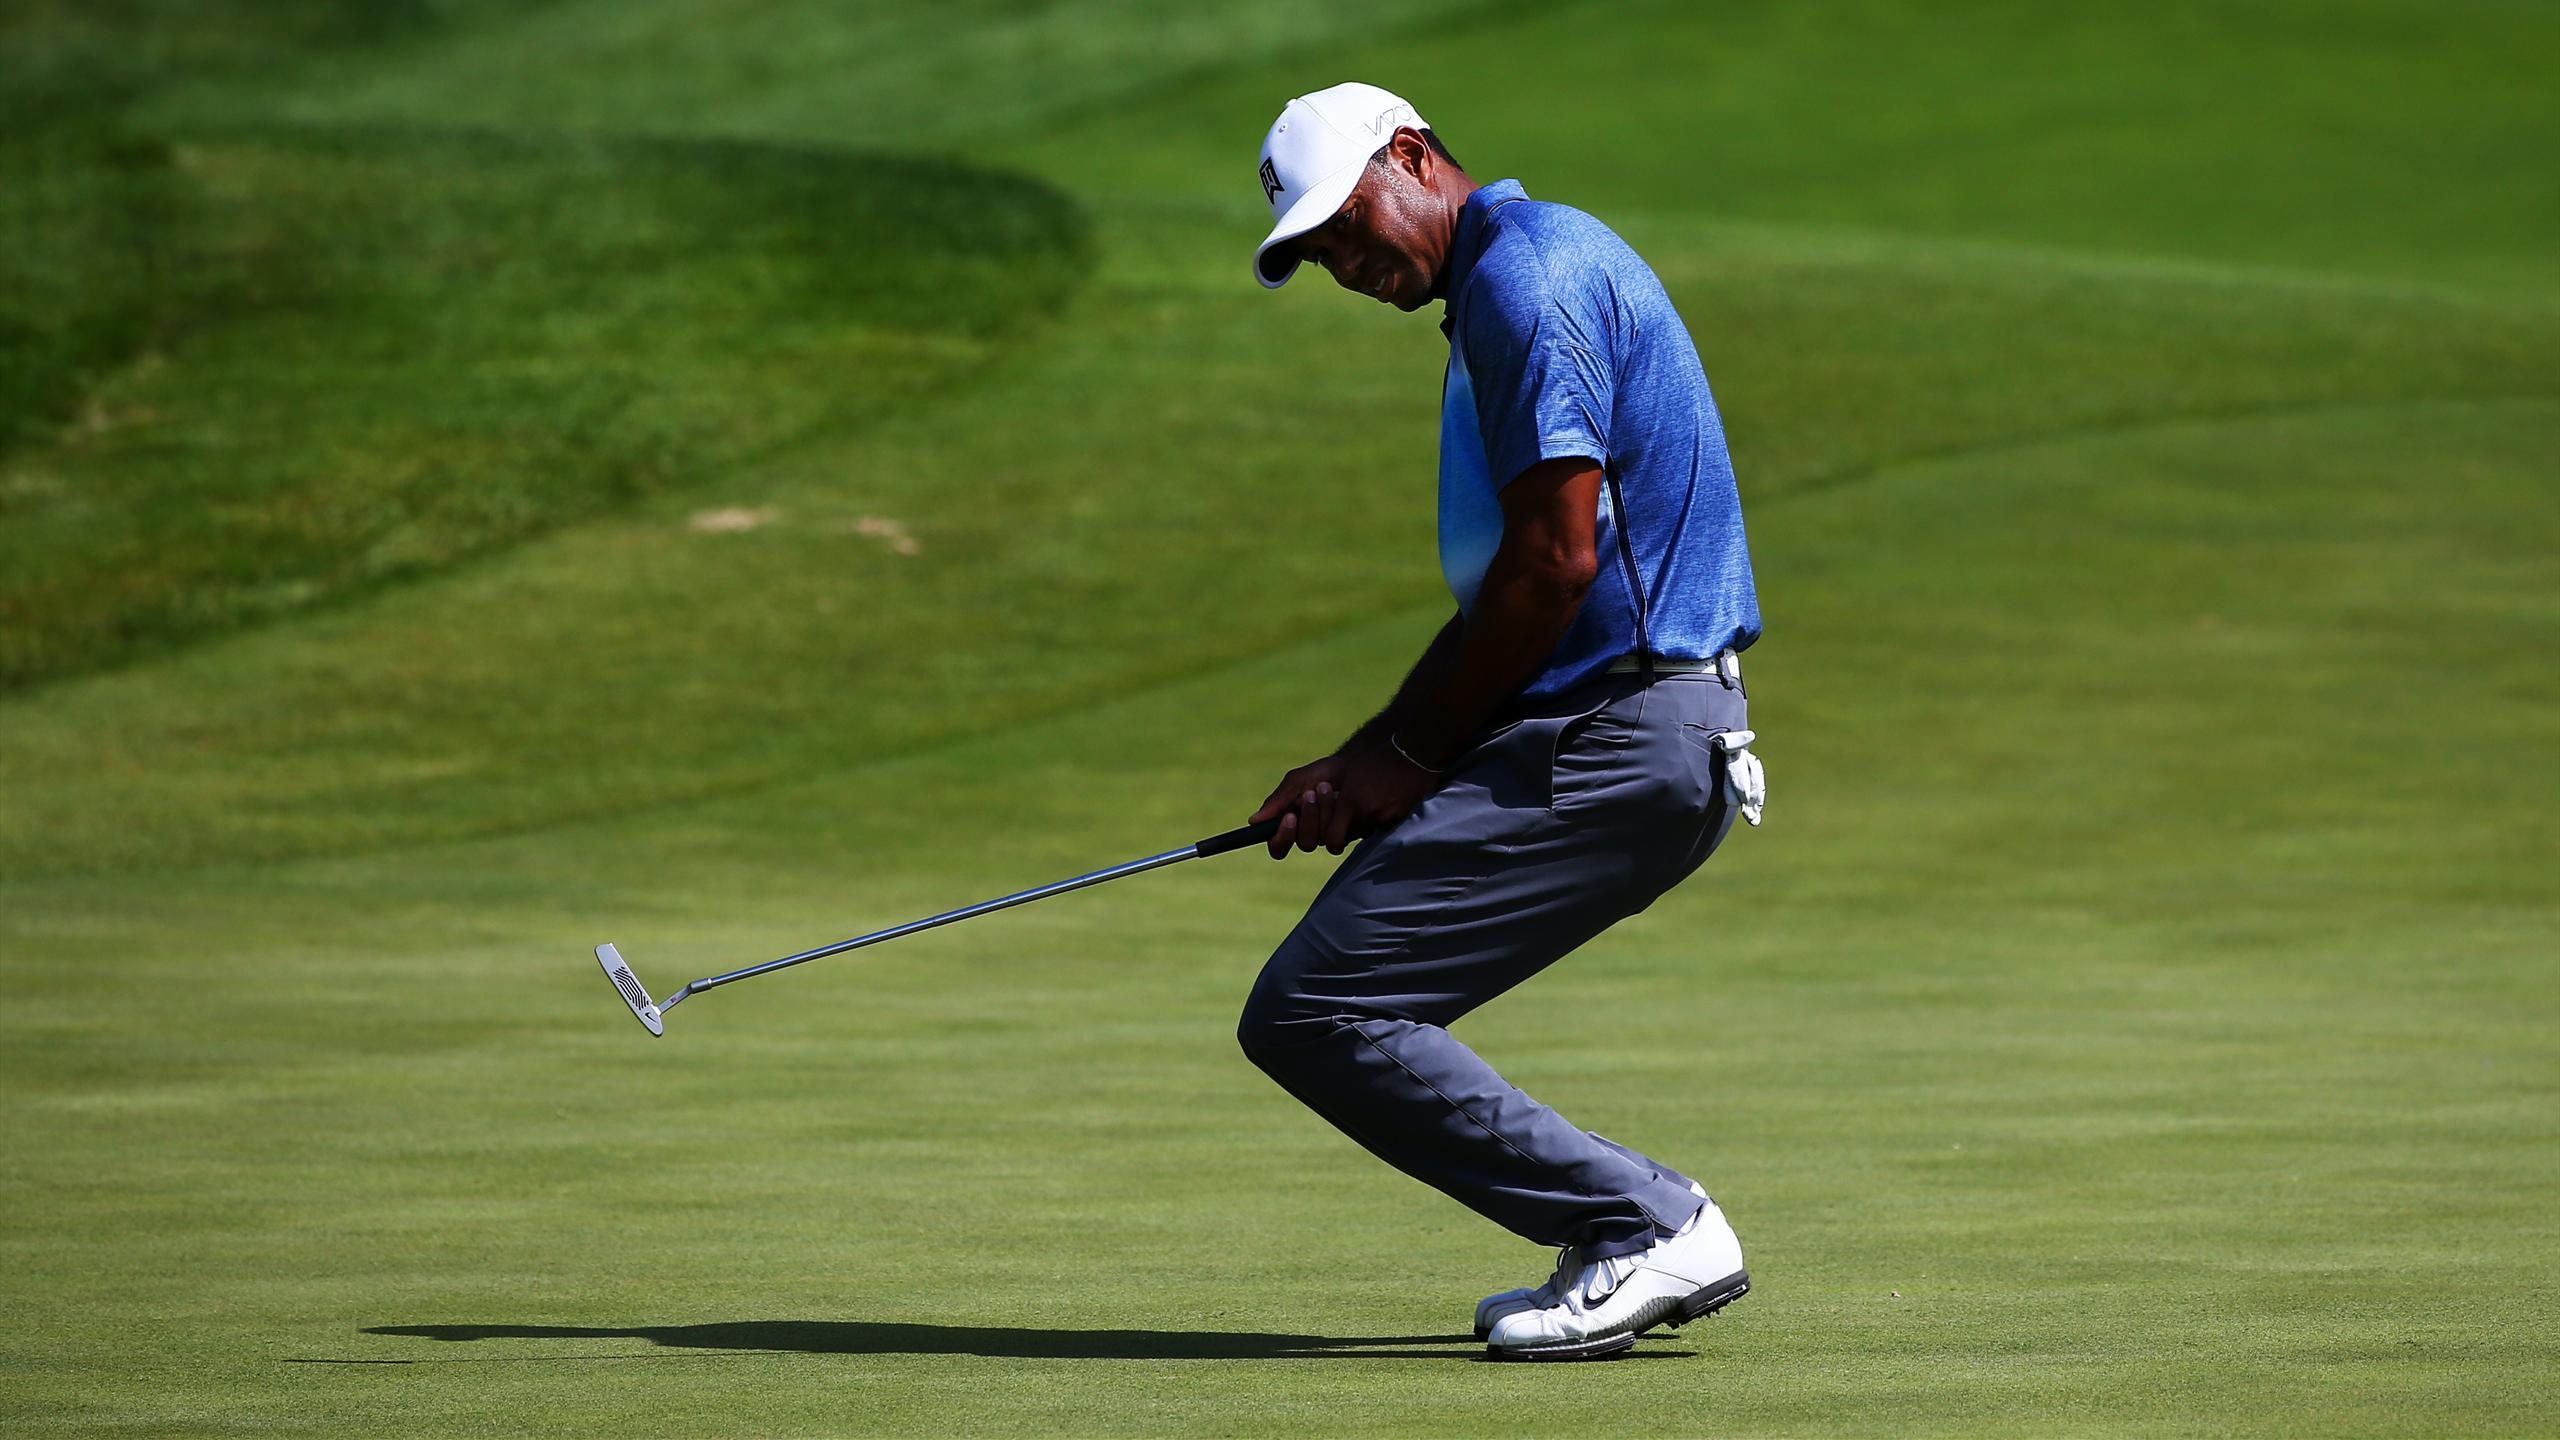 Tiger Woods struggled on the greens.